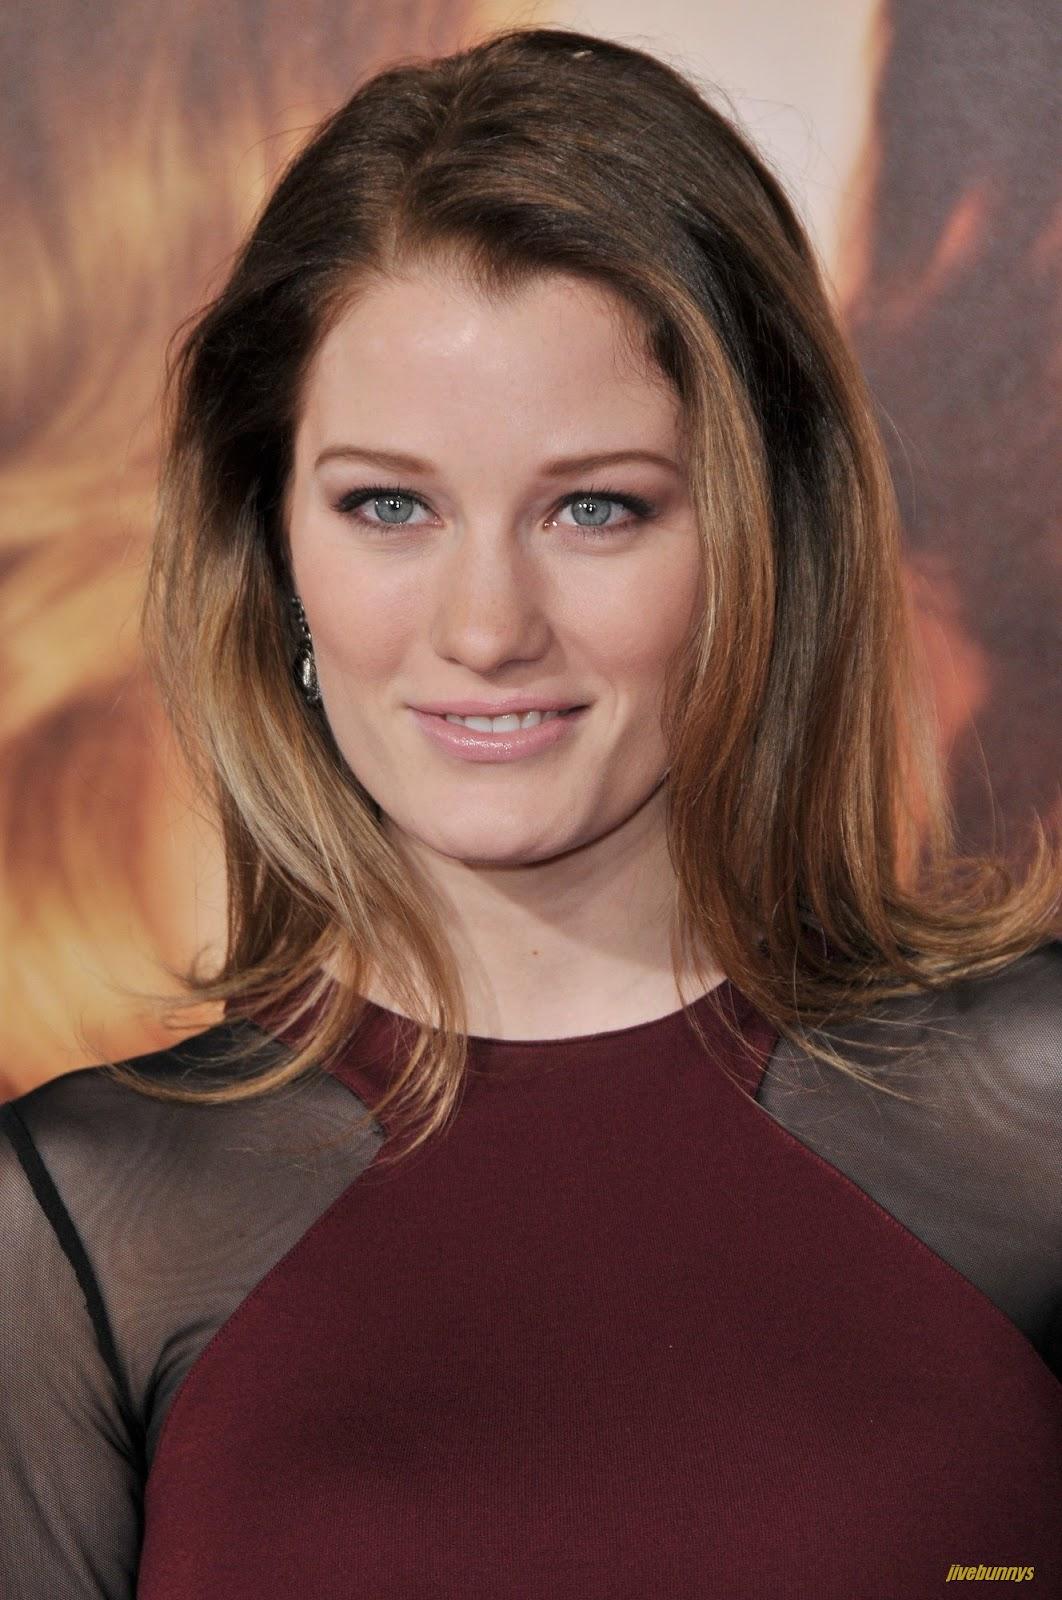 Jivebunnys Female Celebrity Picture Gallery: Ashley ...